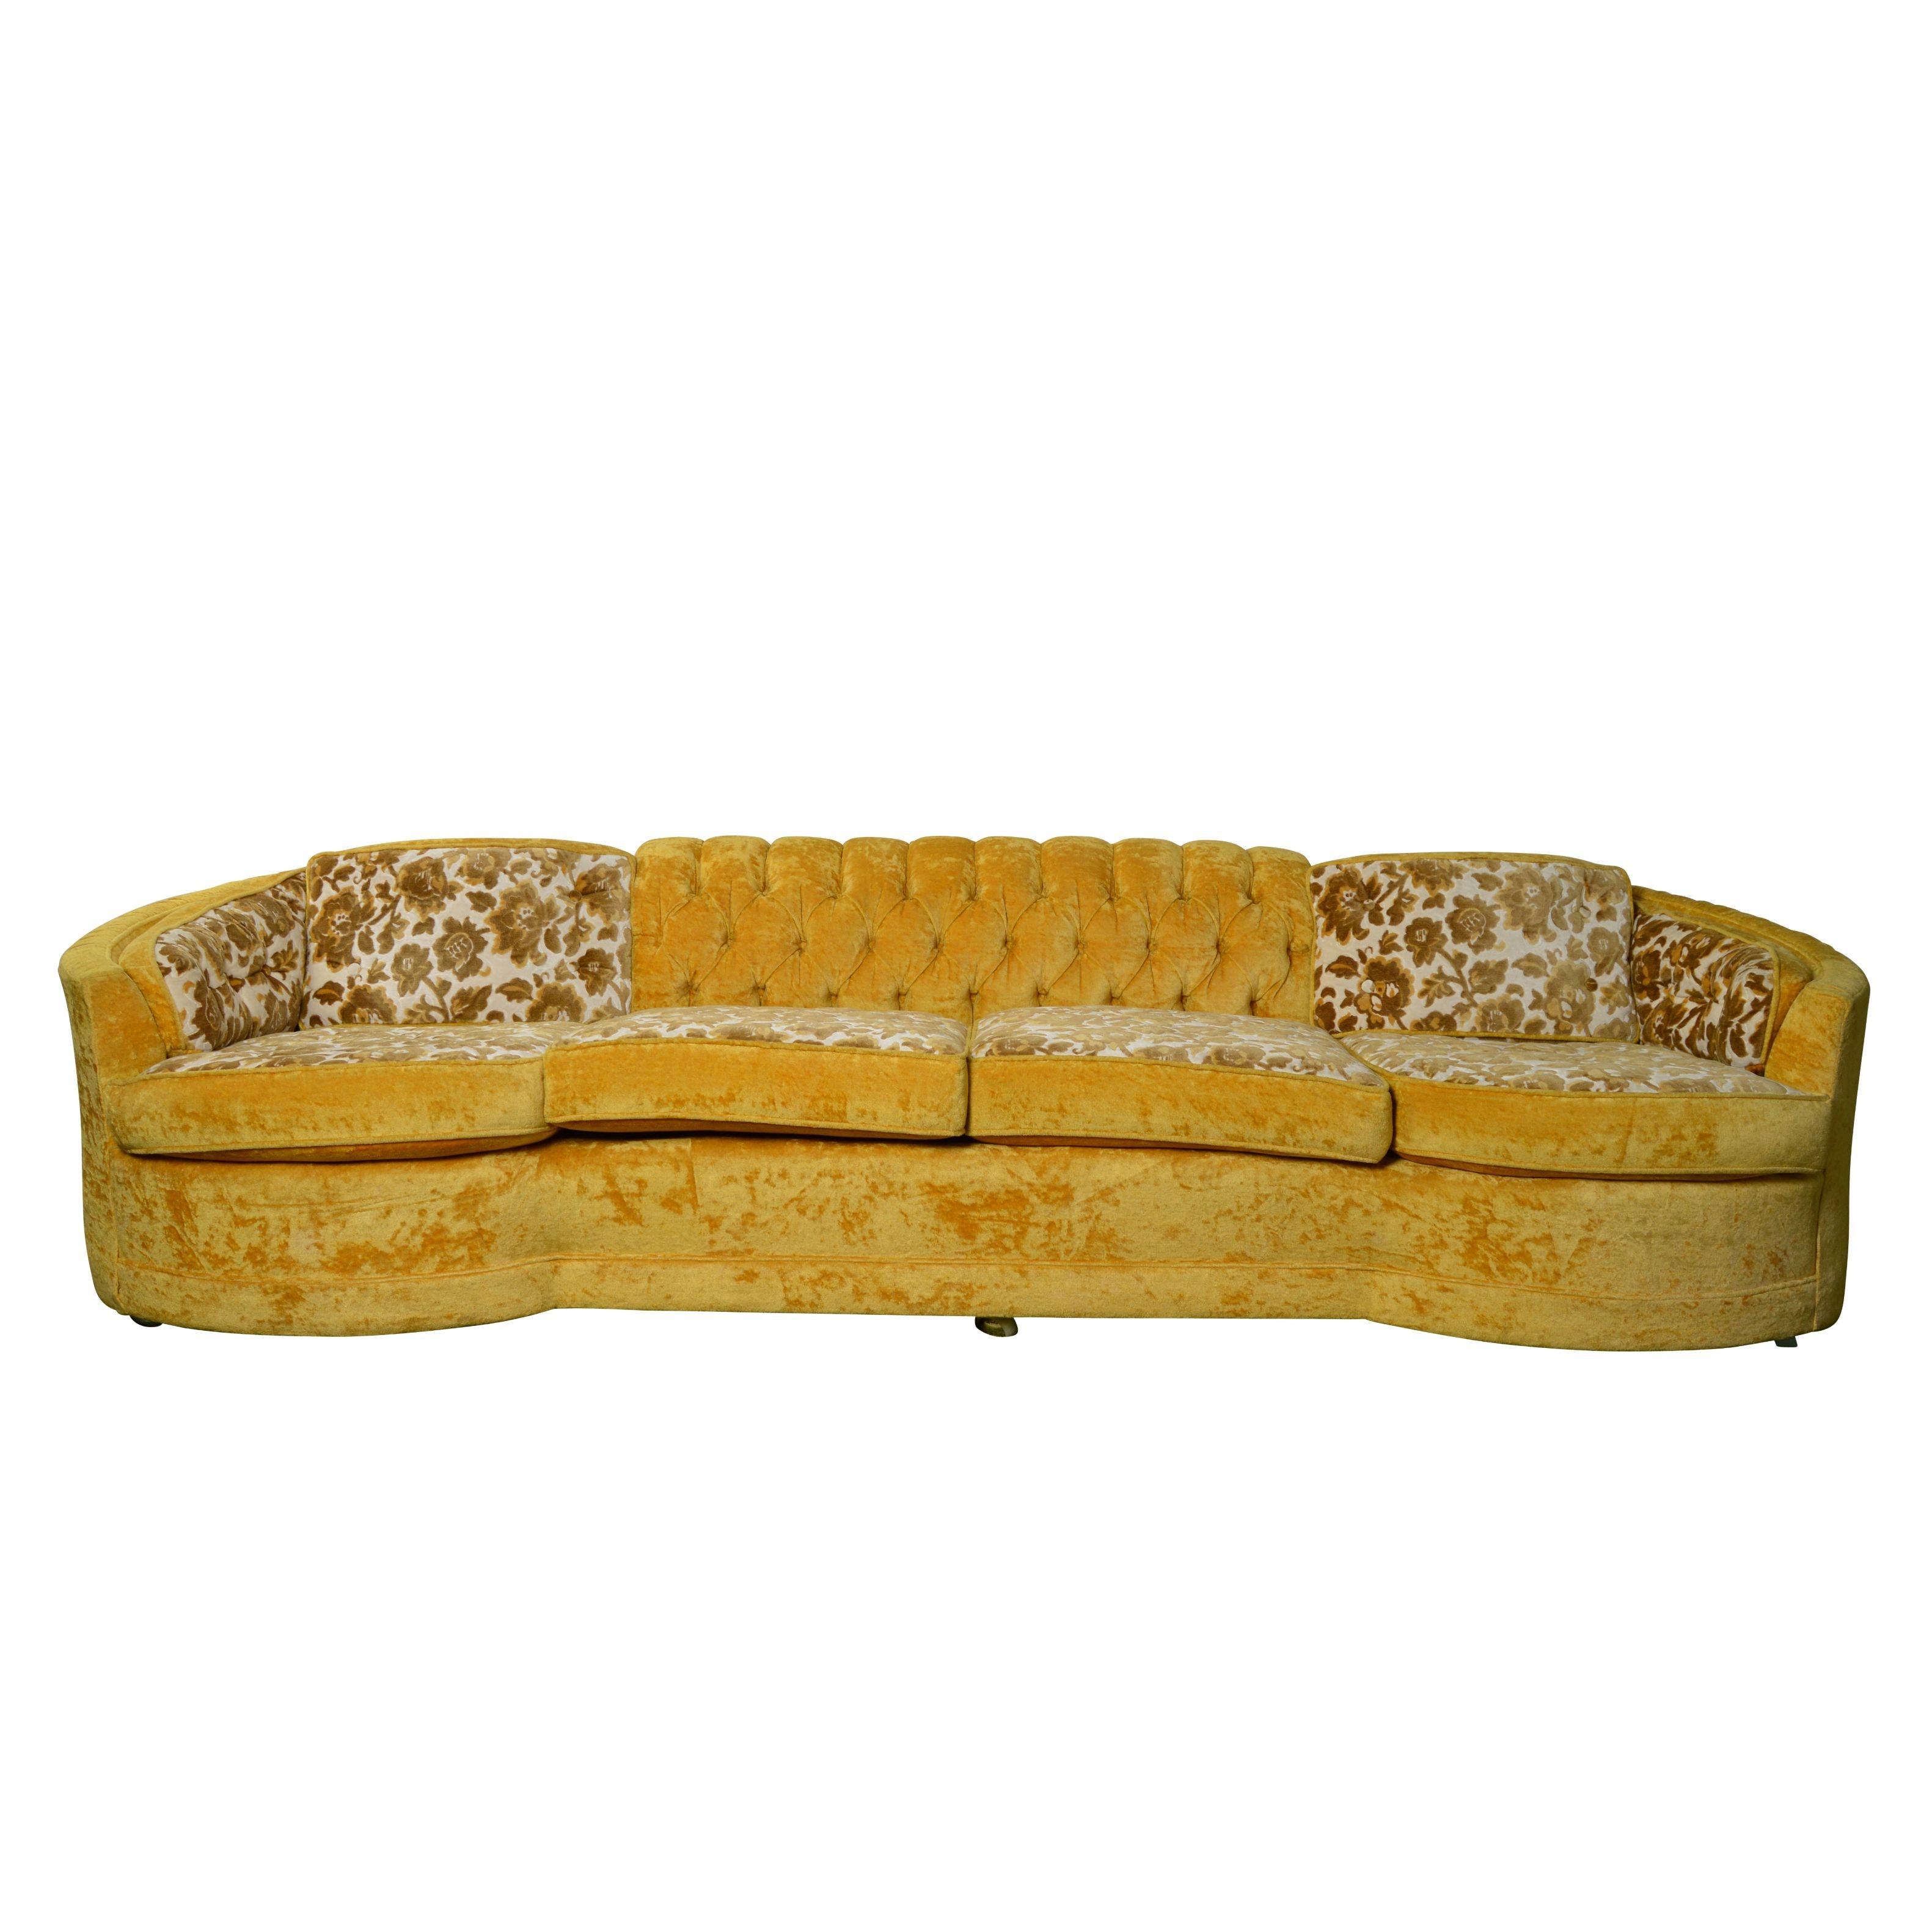 Vintage Mid 20th-Century Crushed Velvet Upholstered Sofa